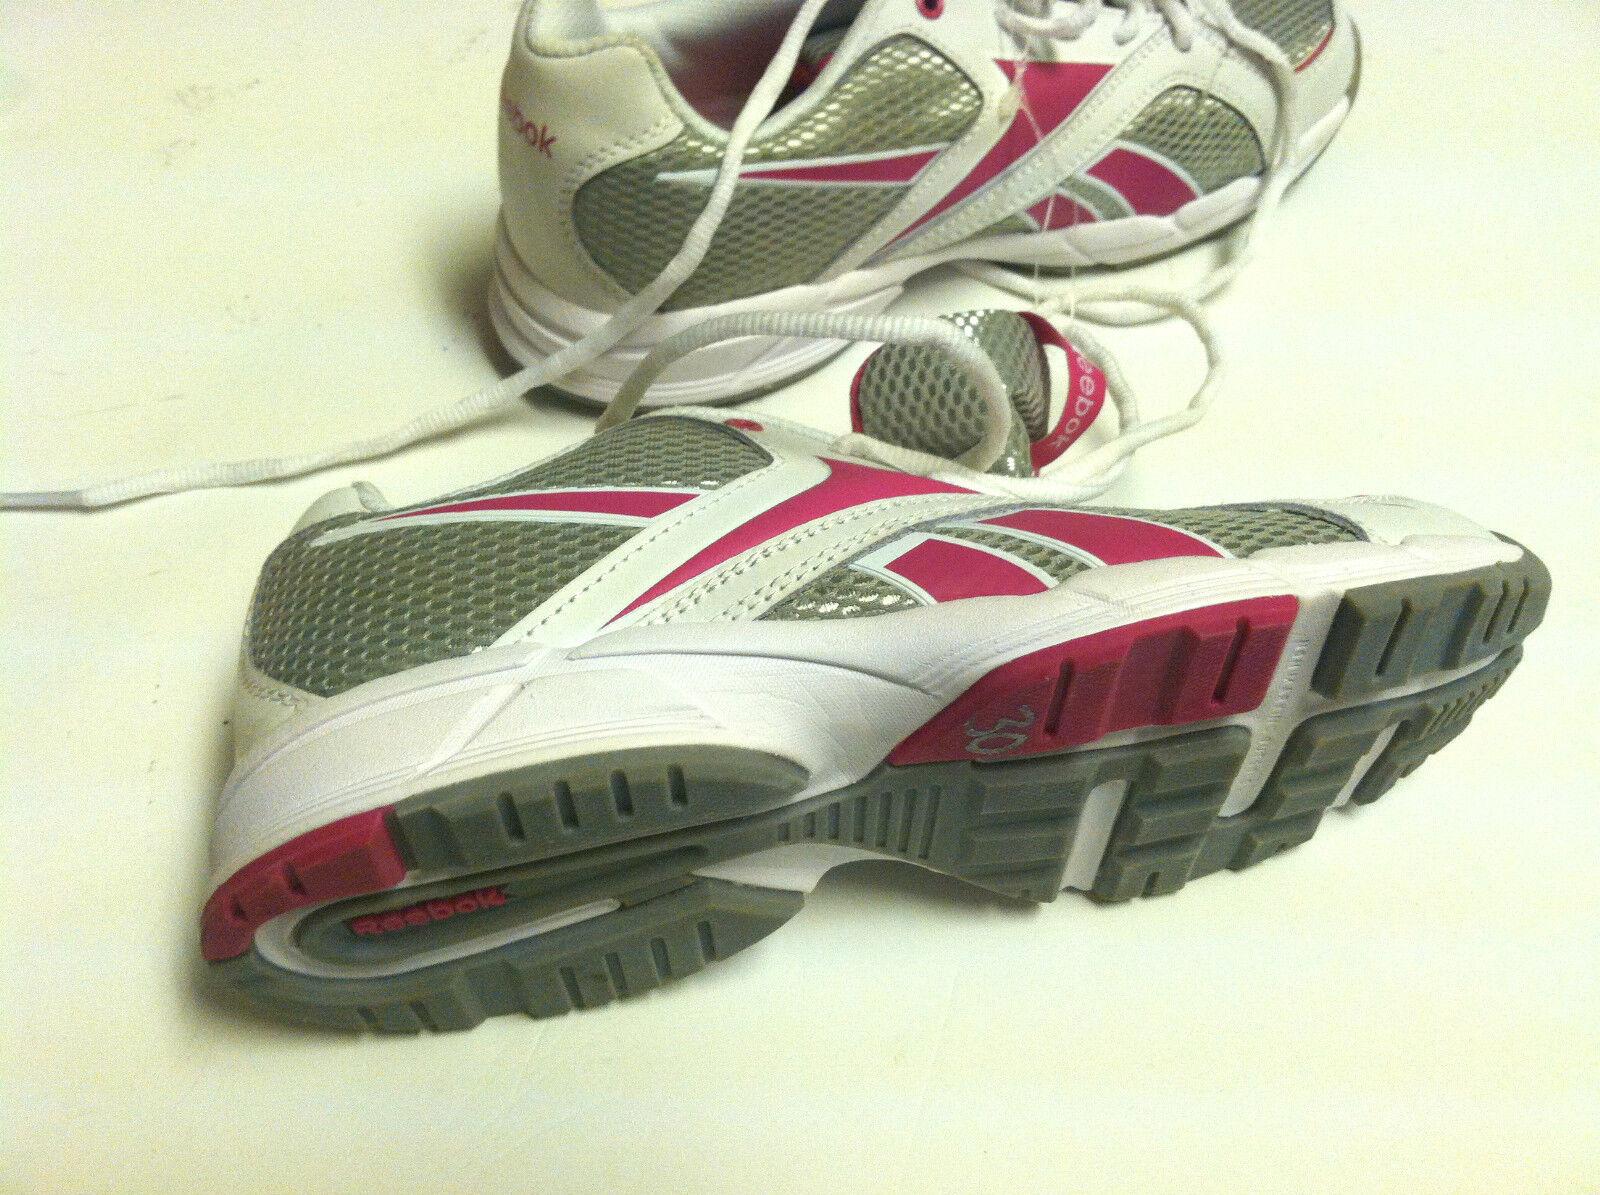 Reebok - Running scarpe scarpe scarpe da ginnastica - Leggero - Misura 5 - Nuove senza Scatola - B-SHO-11 | Imballaggio elegante e stabile  | Sig/Sig Ra Scarpa  fc0a86